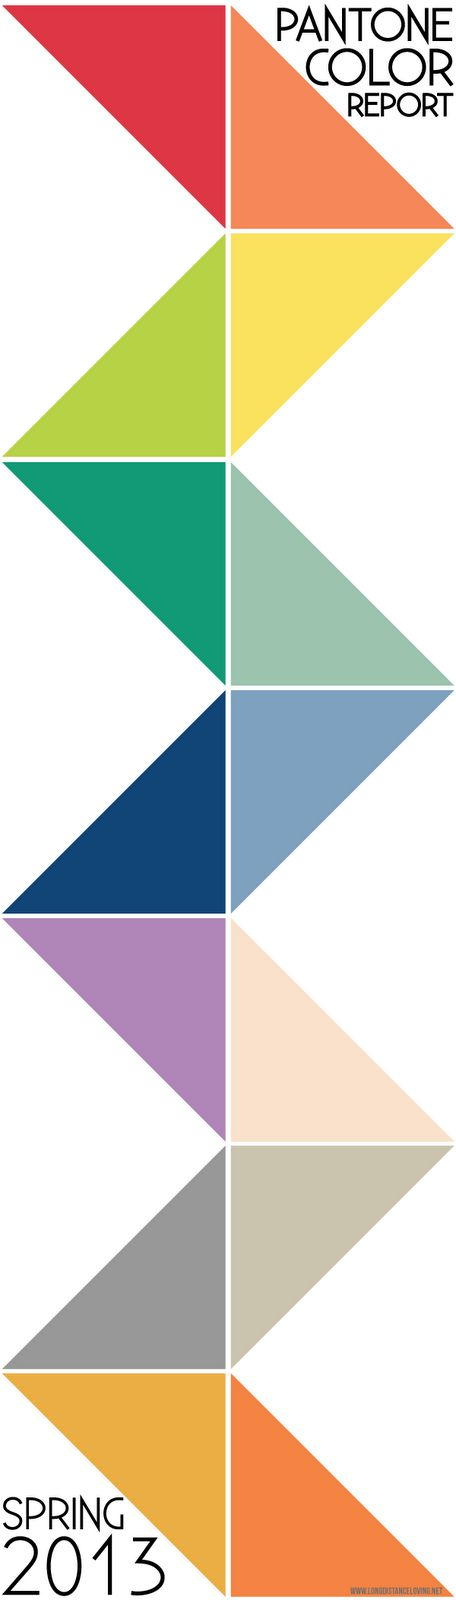 Pantone Color Report: Spring 2013